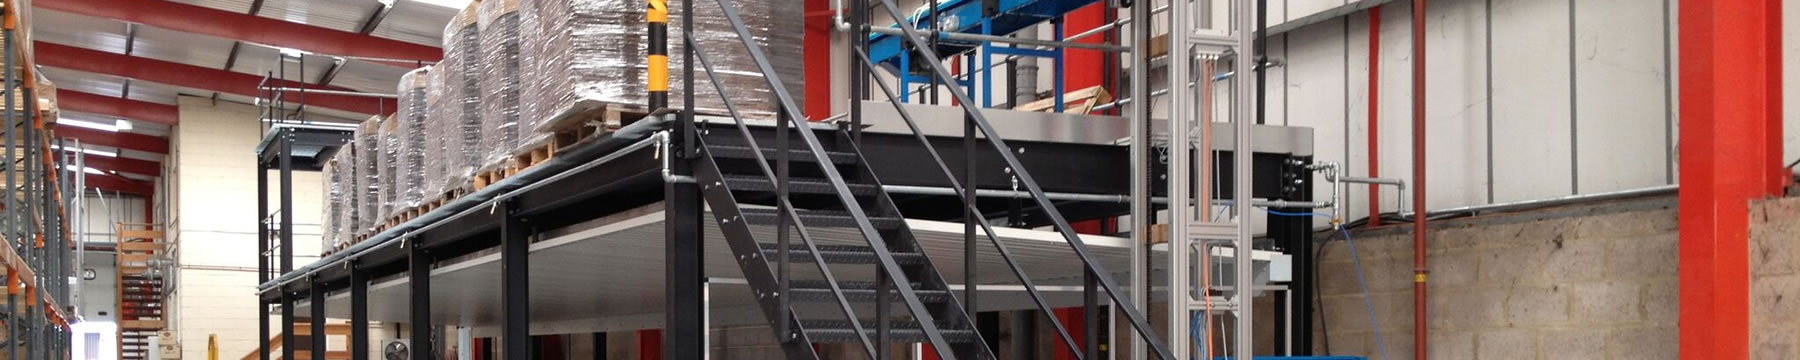 banner-mezzanine-floors